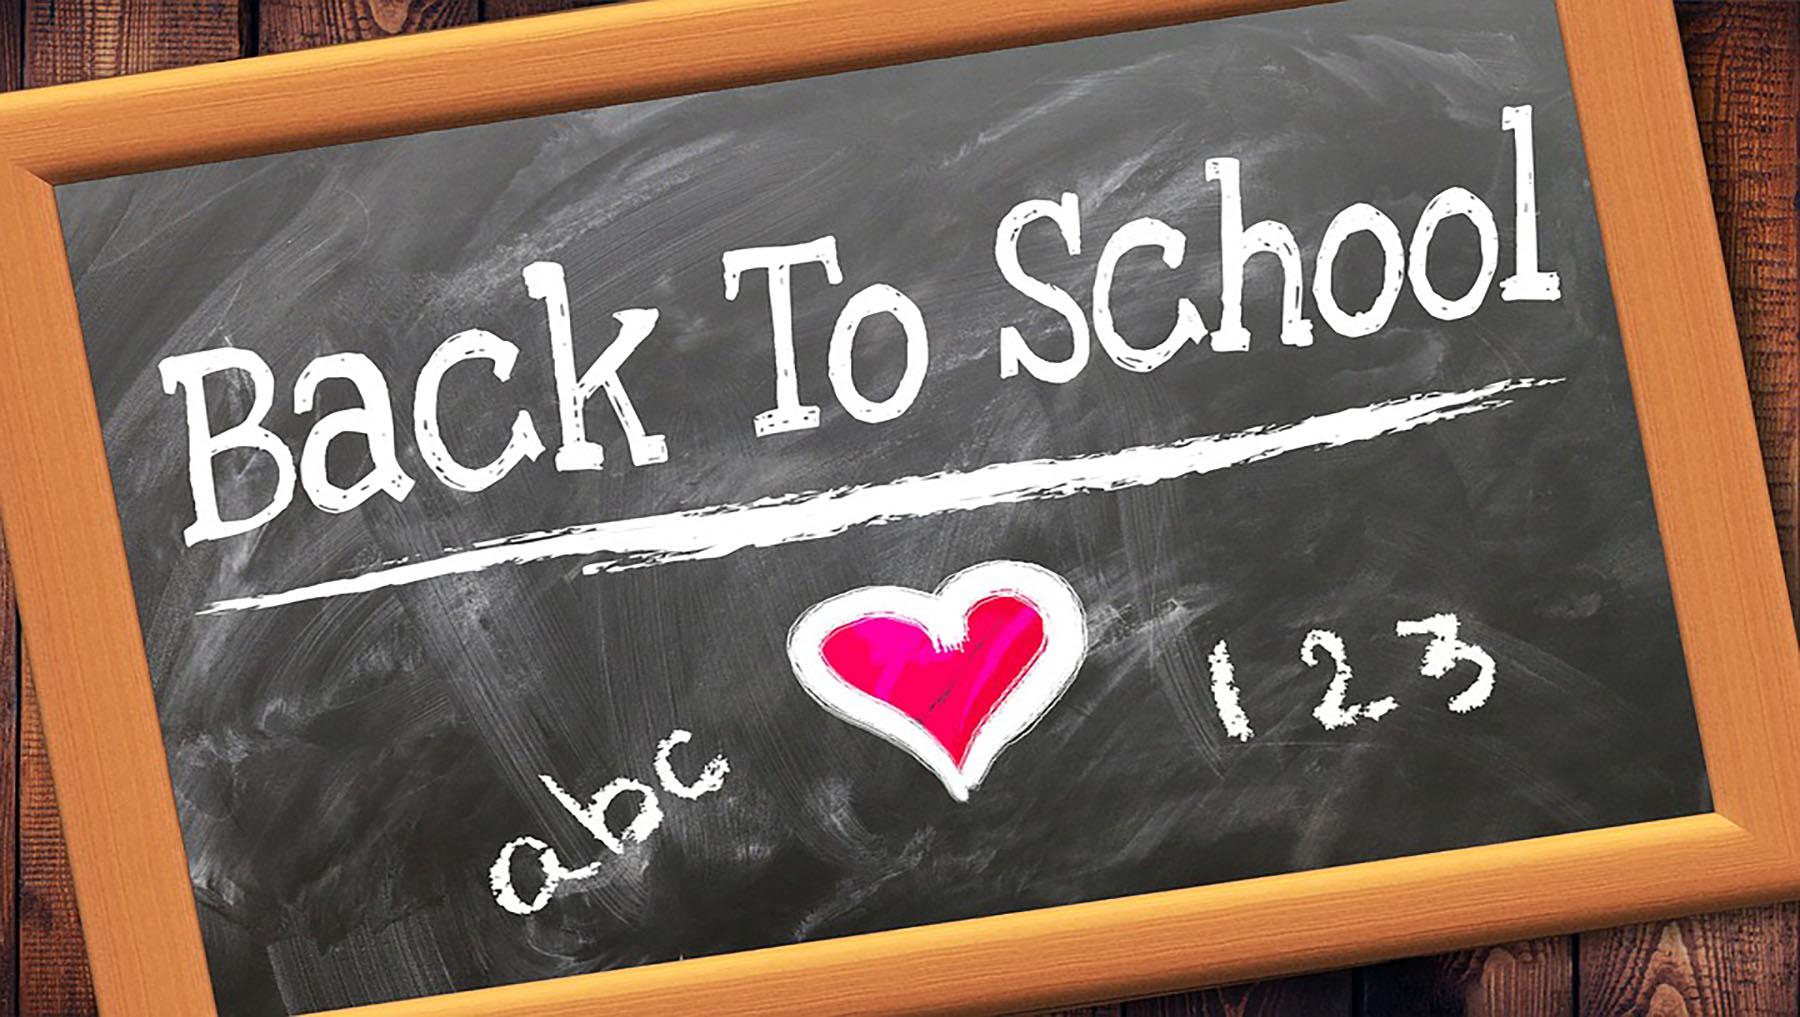 Back-to-School (BTS) Marketing Starts Again